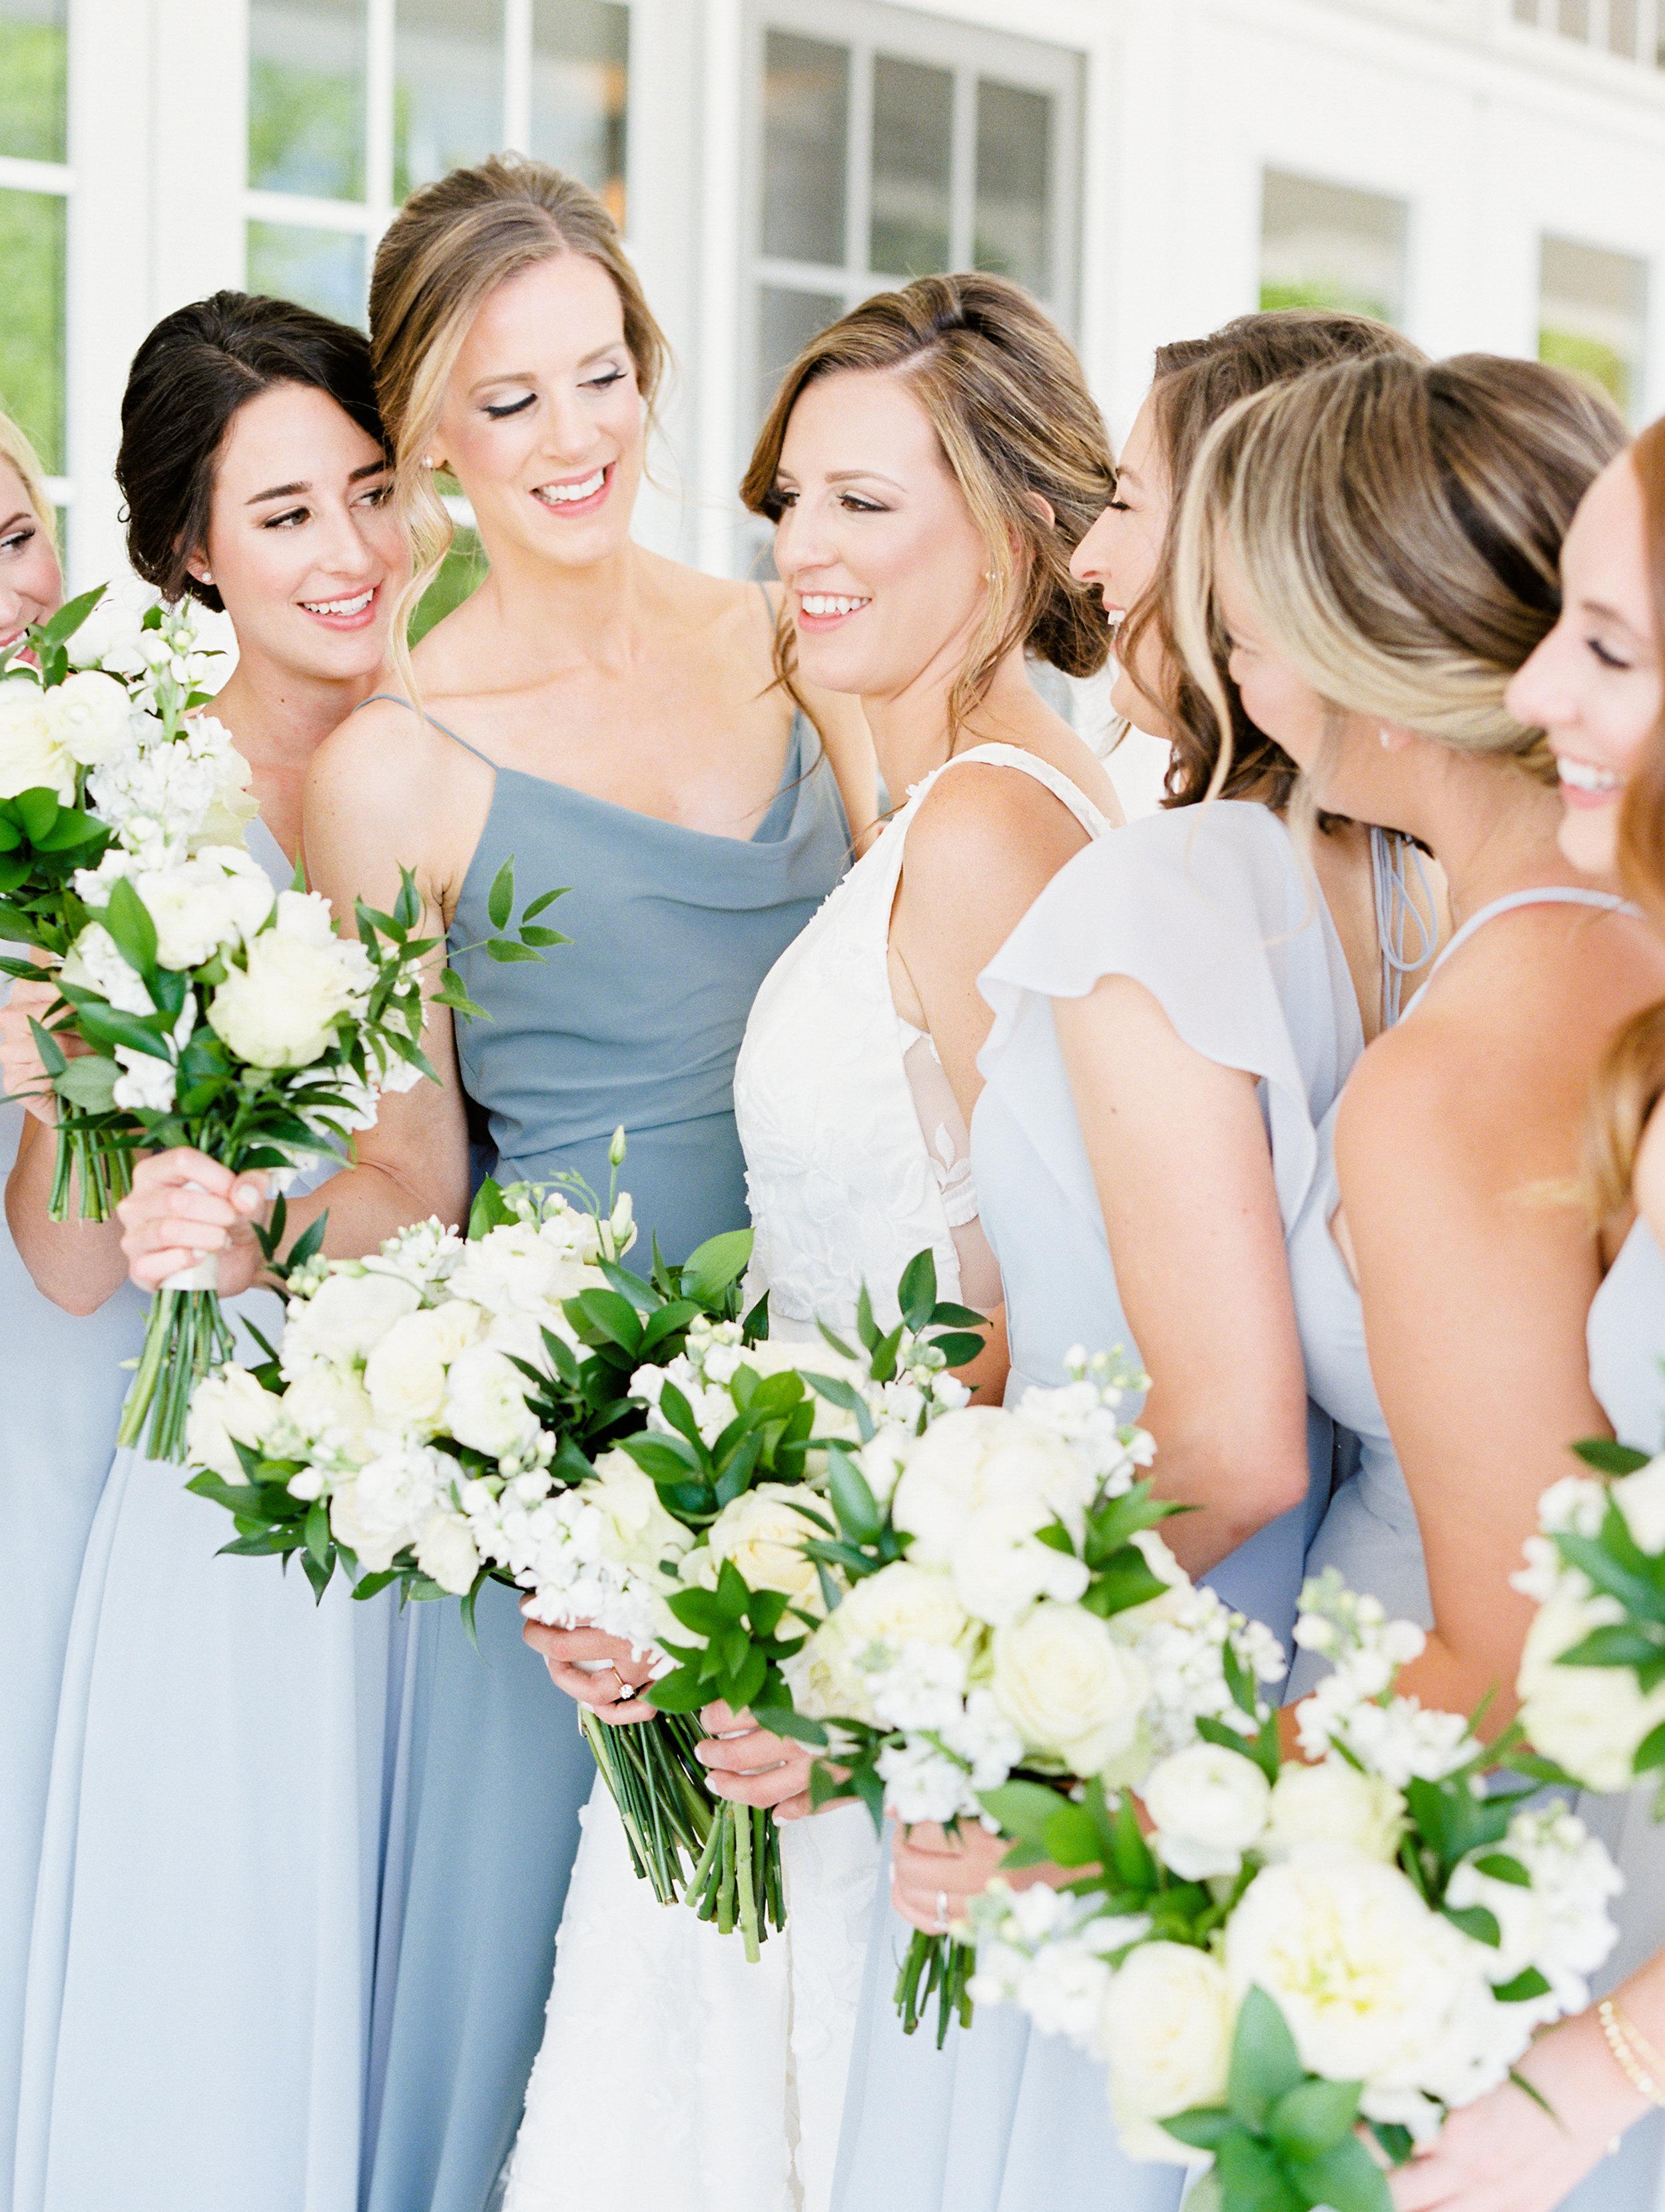 DeGuilio+Wedding+Bridal+Partyf-20.jpg